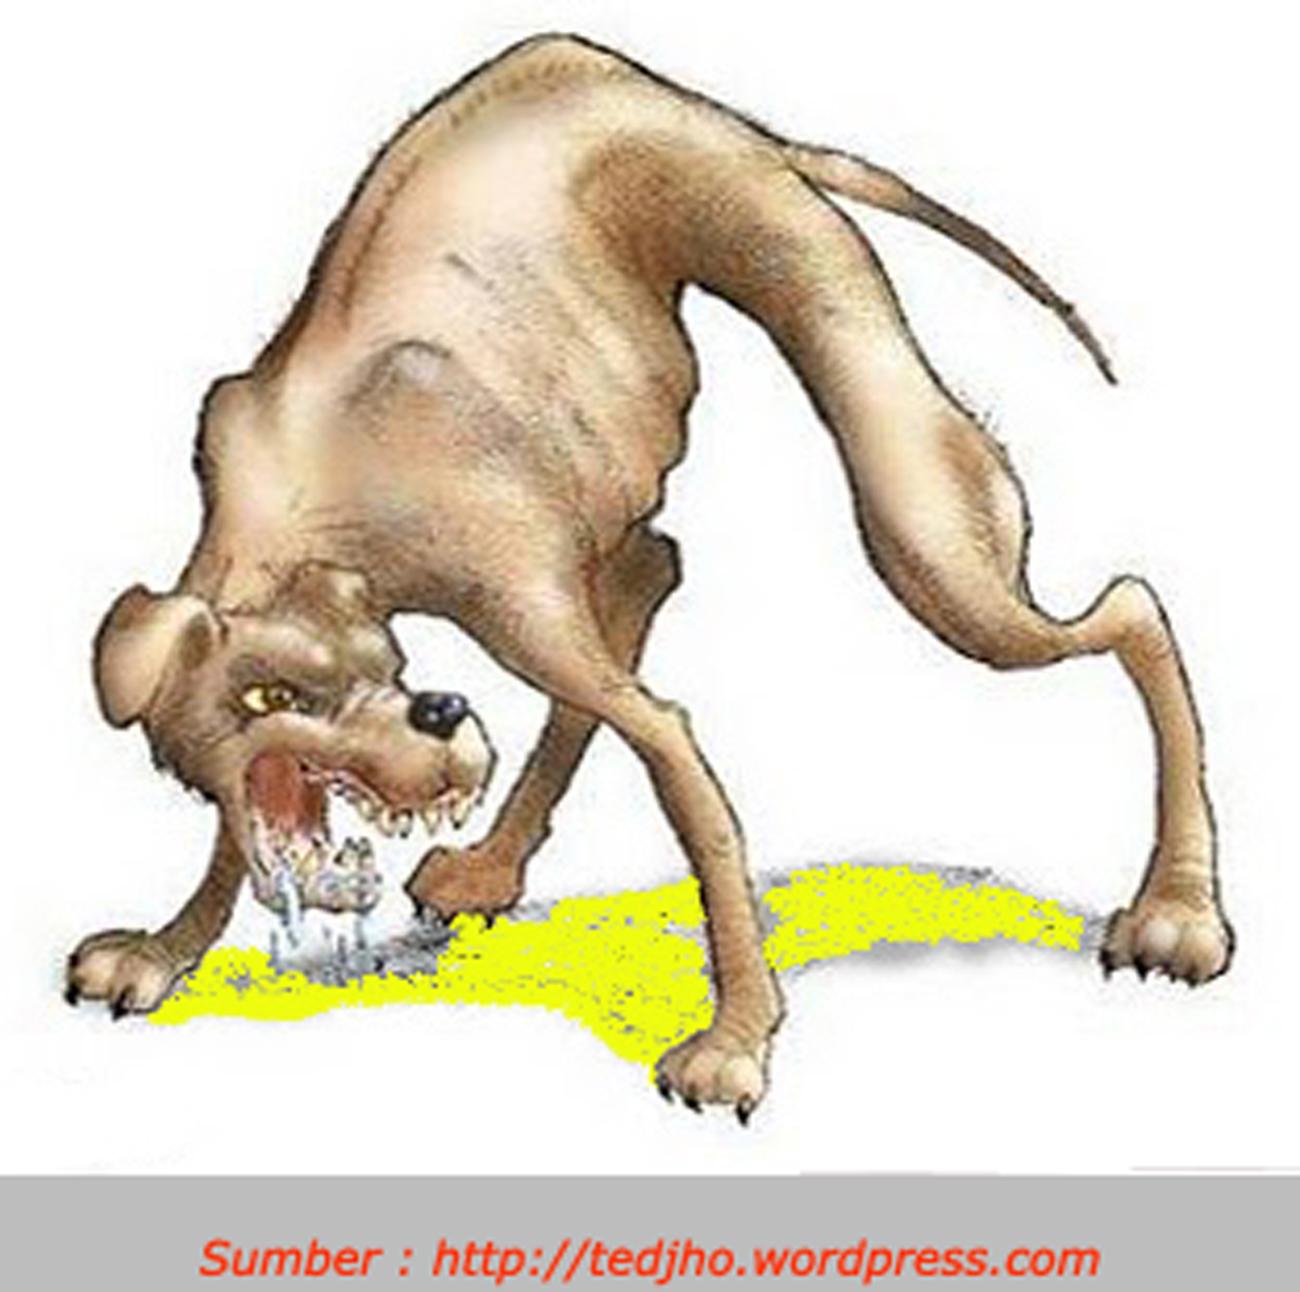 Human with rabies symptoms